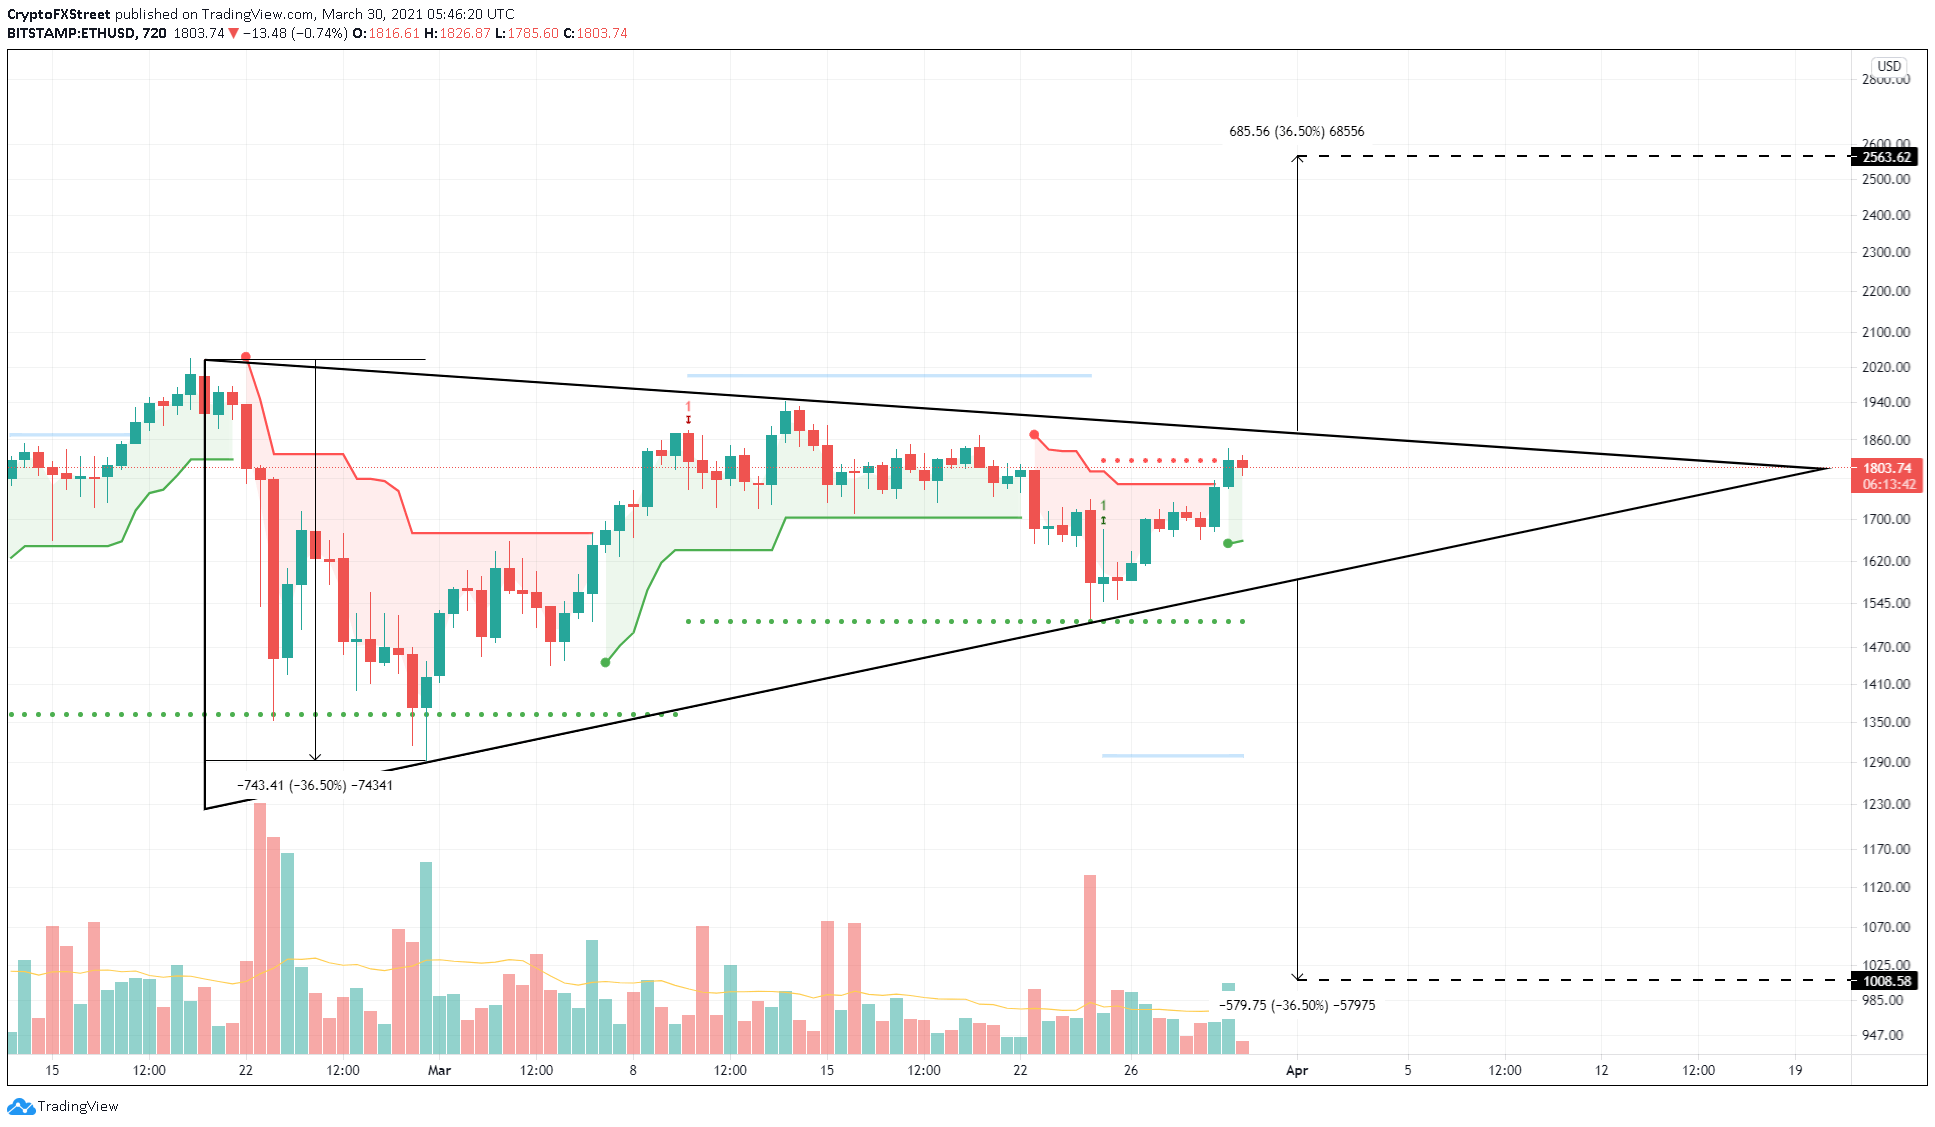 ETH/USDT 12-hour chart